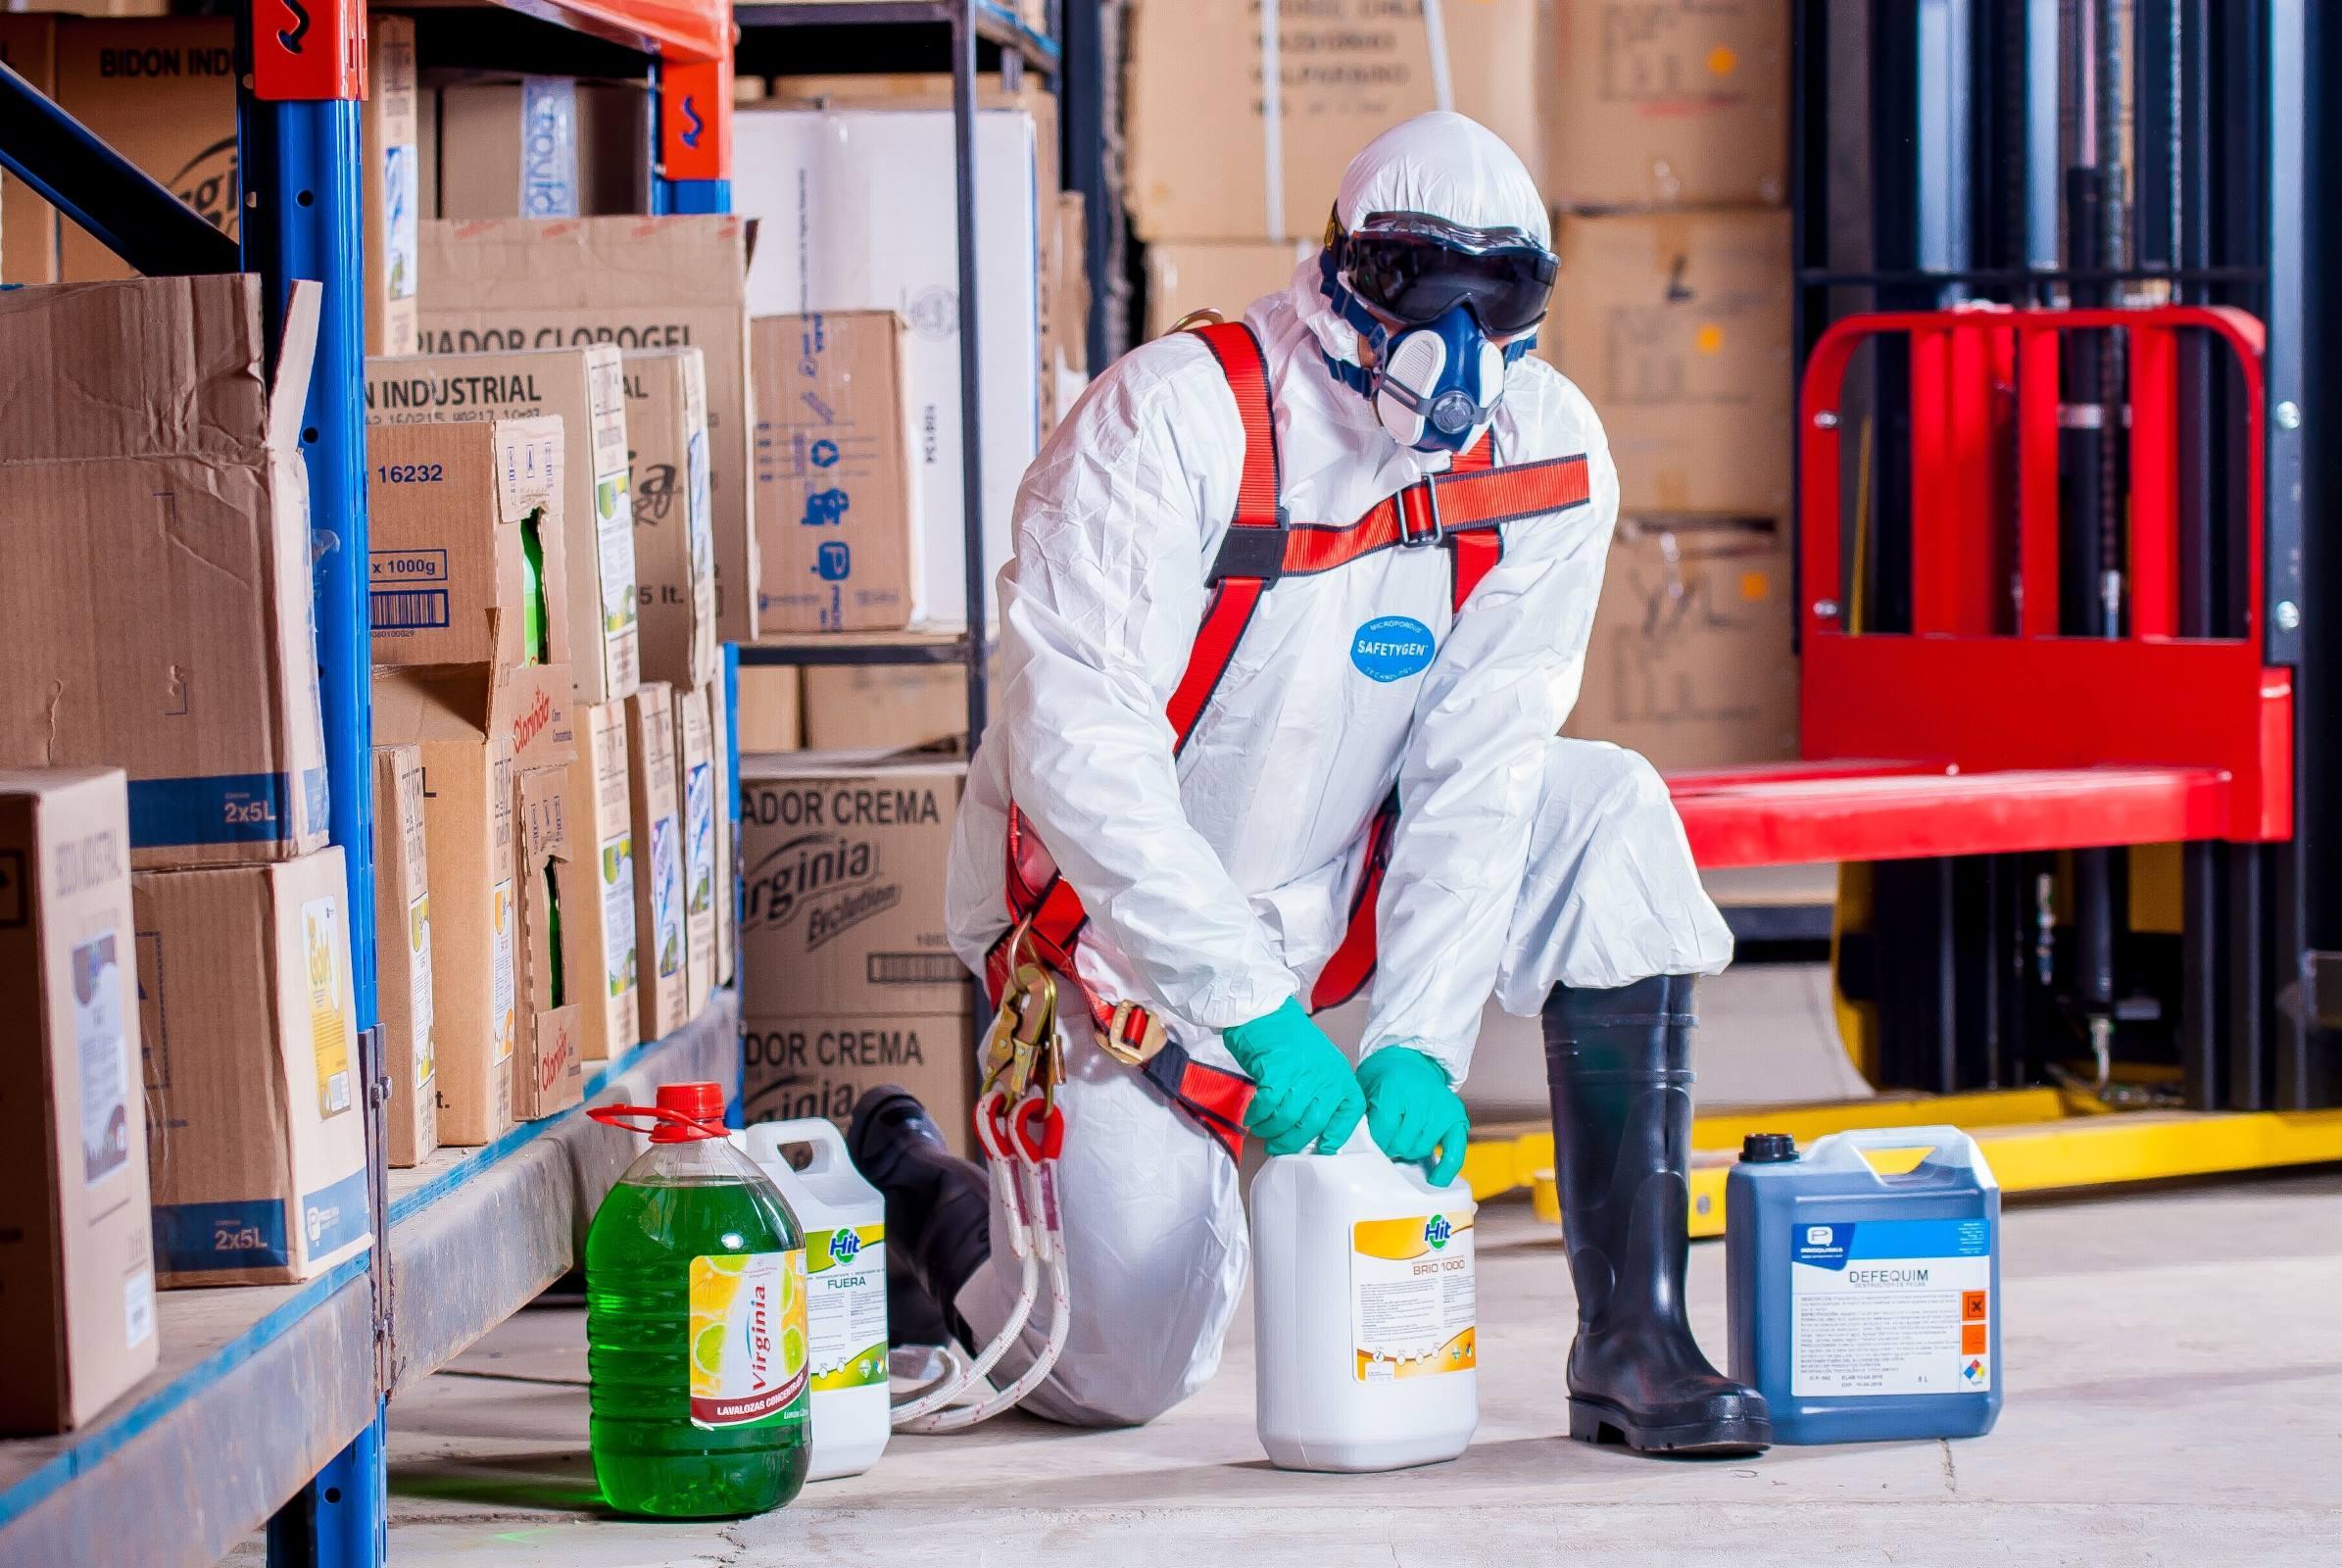 Worker chemicals spraying